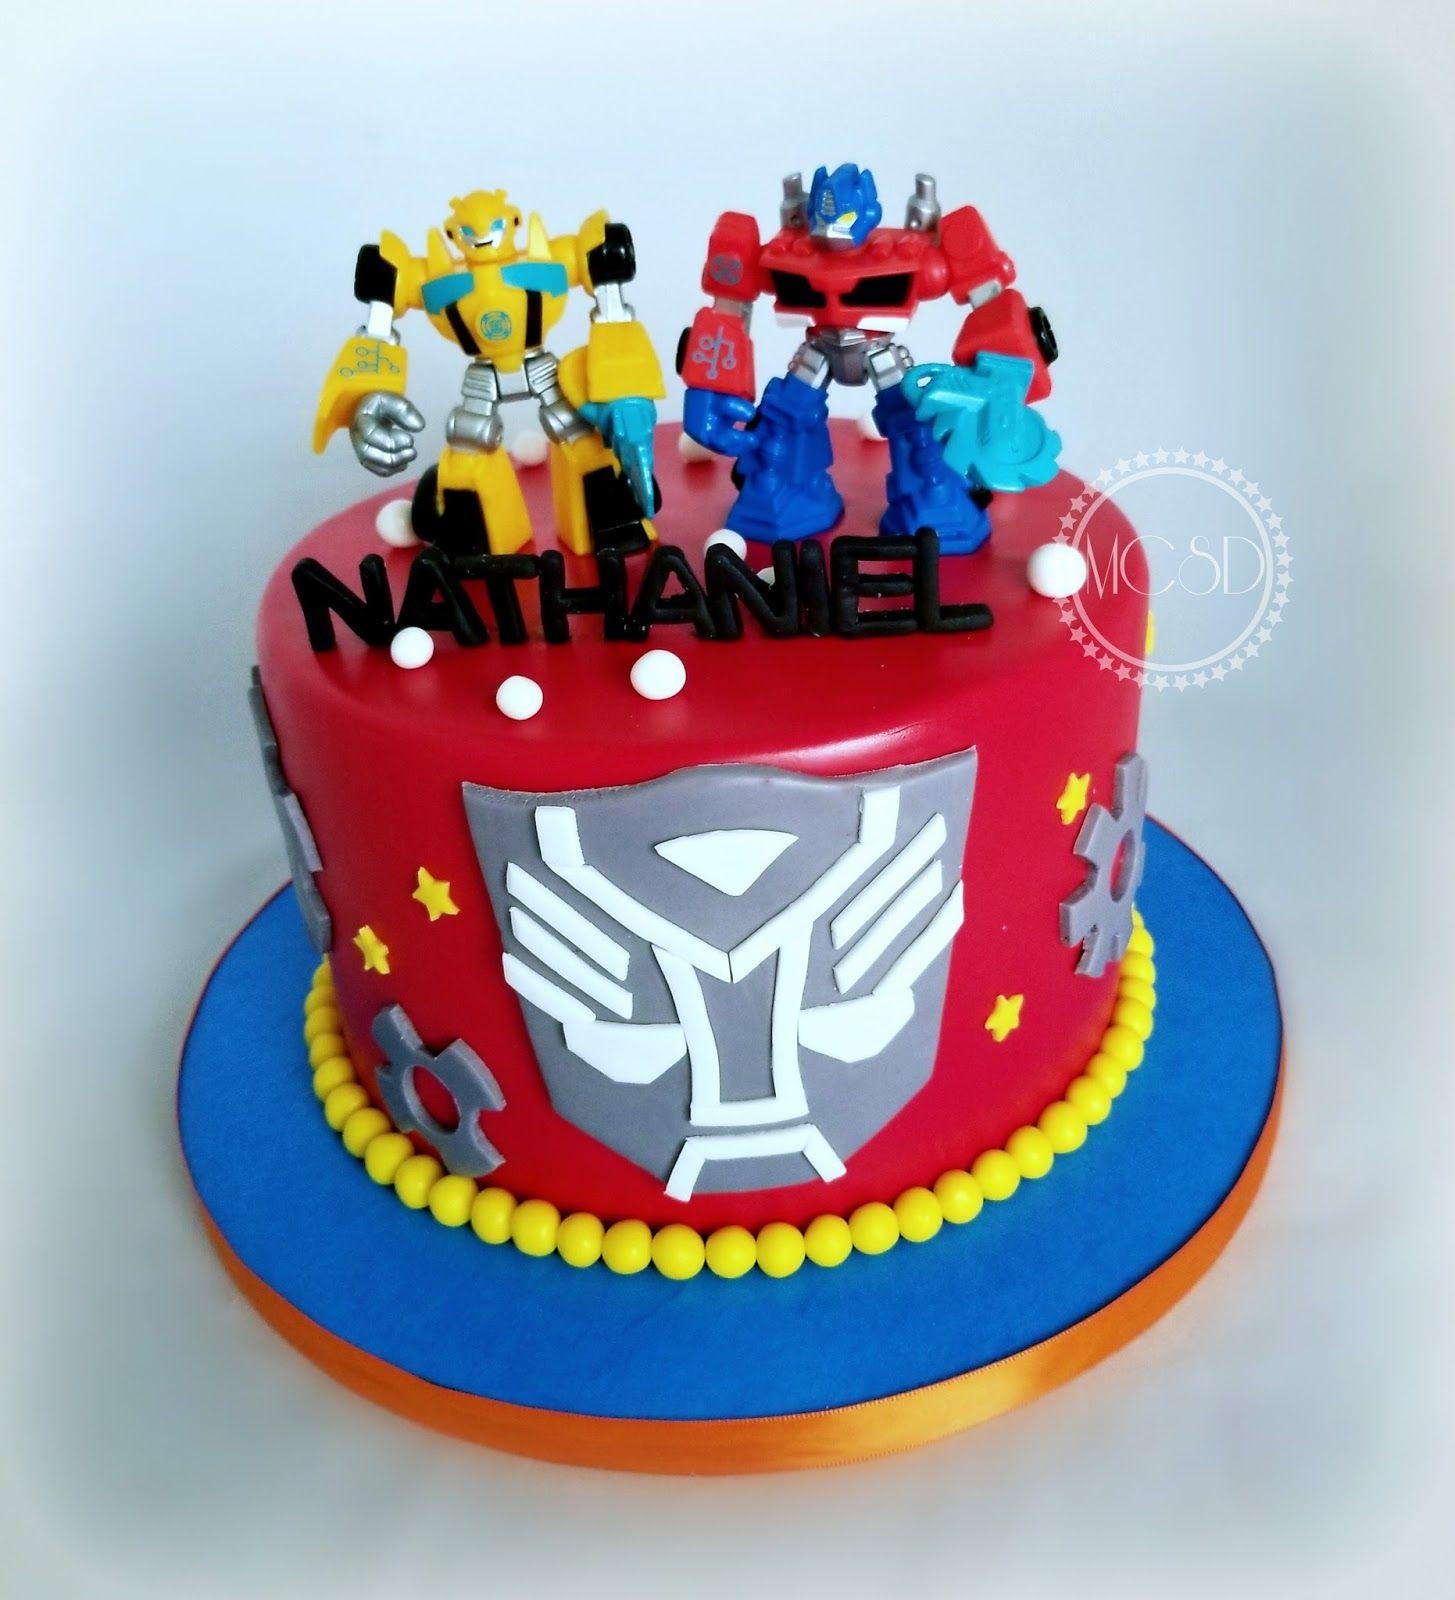 Swell 23 Wonderful Picture Of Transformer Birthday Cake Transformers Funny Birthday Cards Online Ioscodamsfinfo